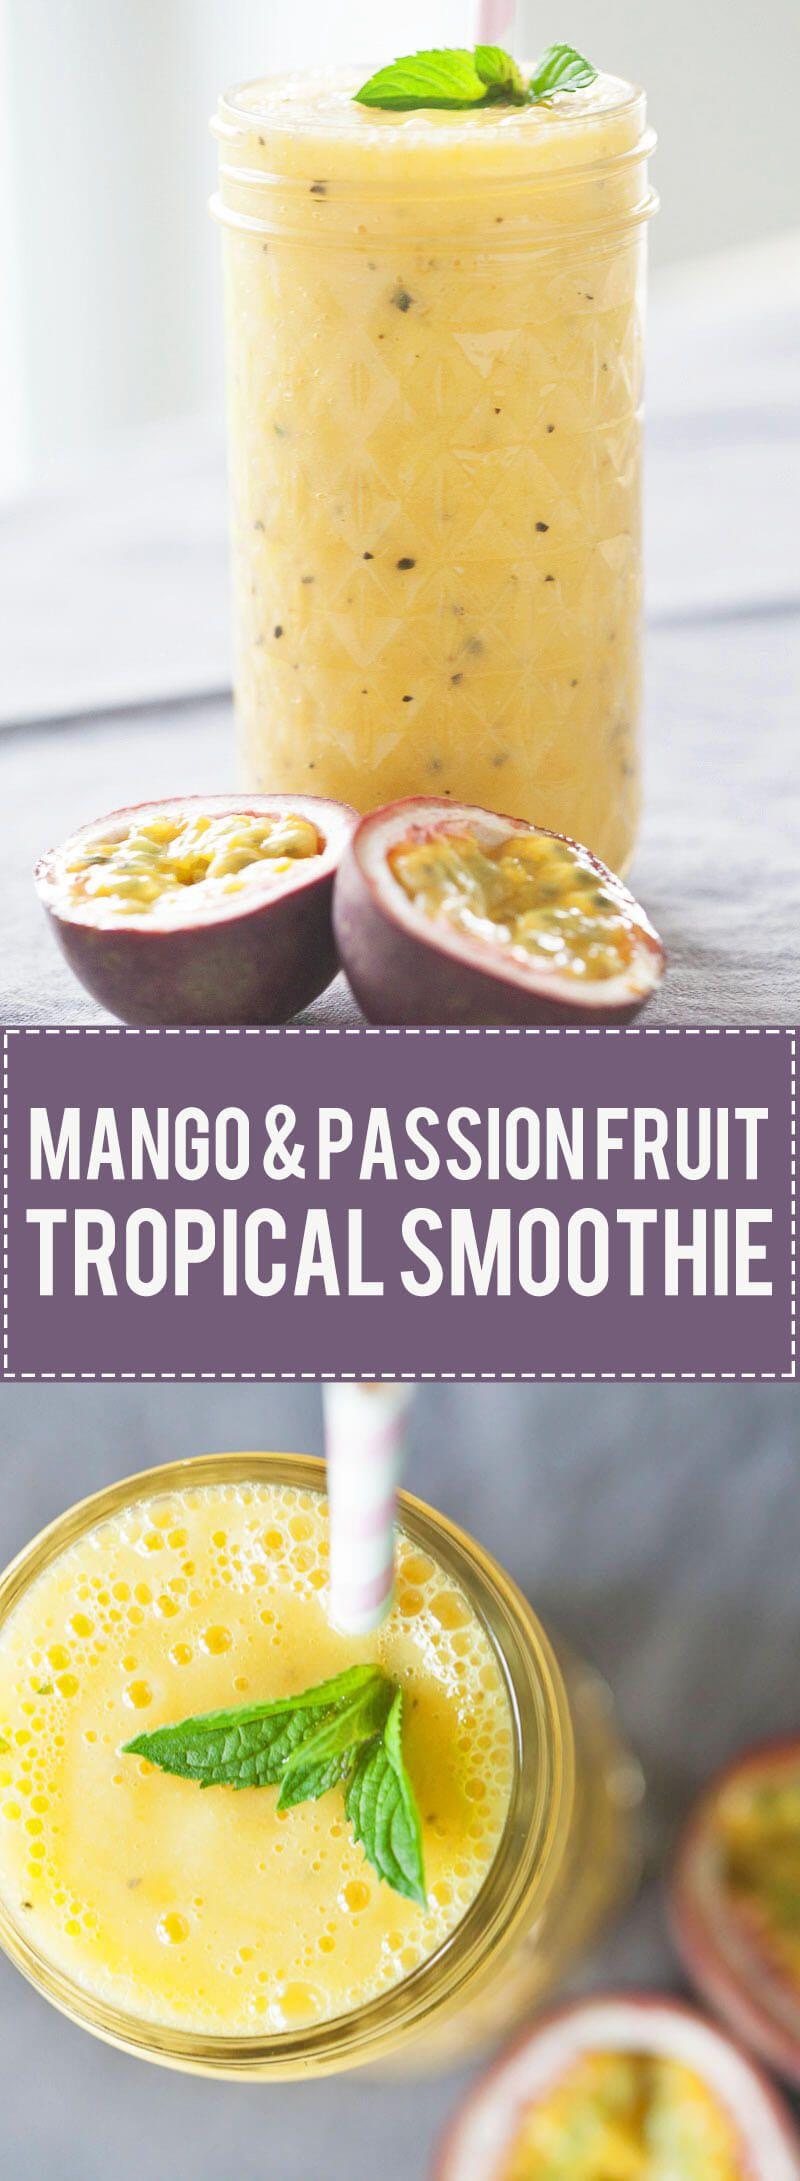 Mango & Passion Fruit Tropical Smoothie